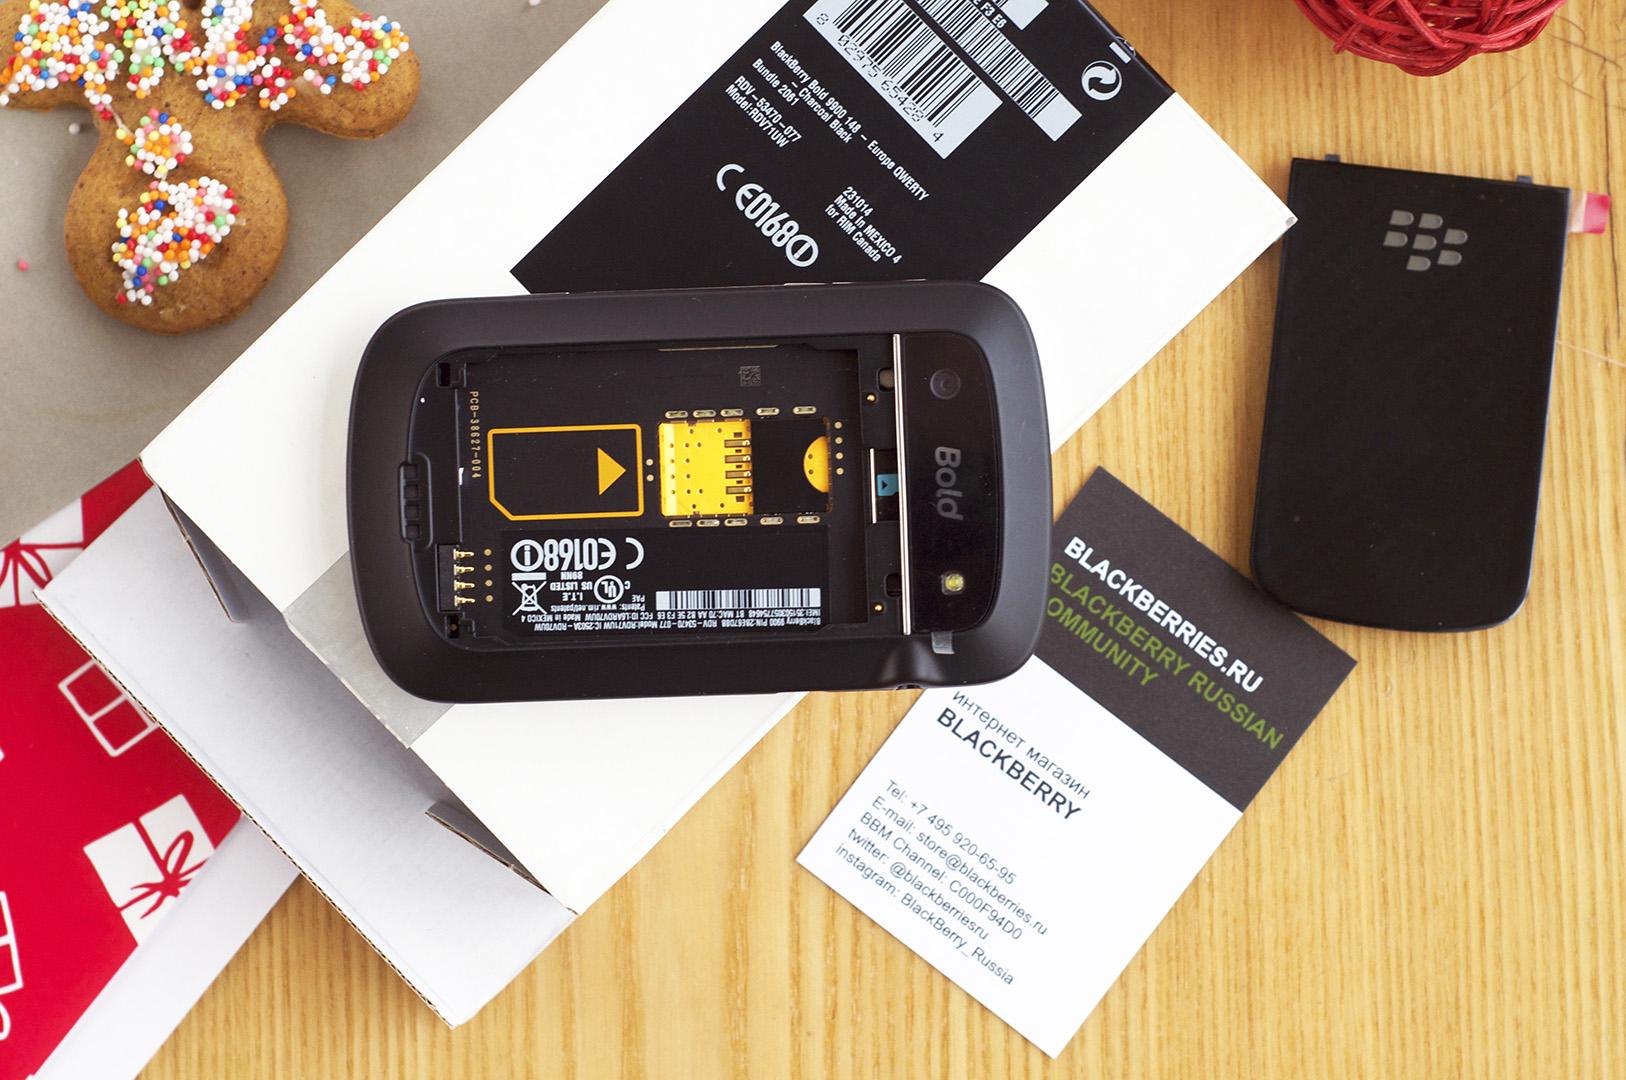 blackberry-9900-bold-2014-6